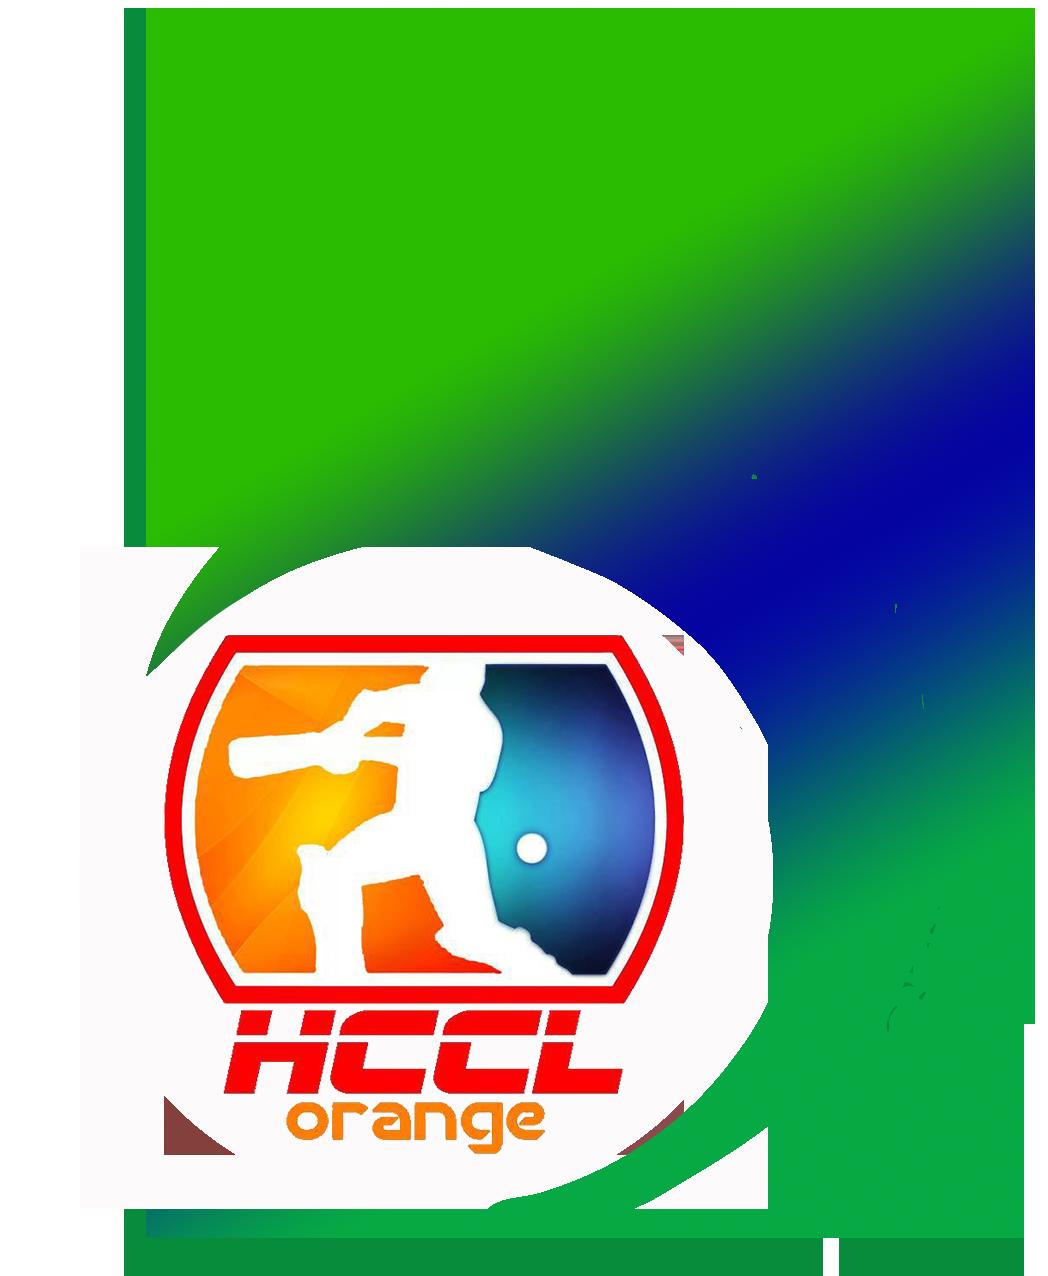 announcing hccl orange 25 hyderabad corporate cricket league